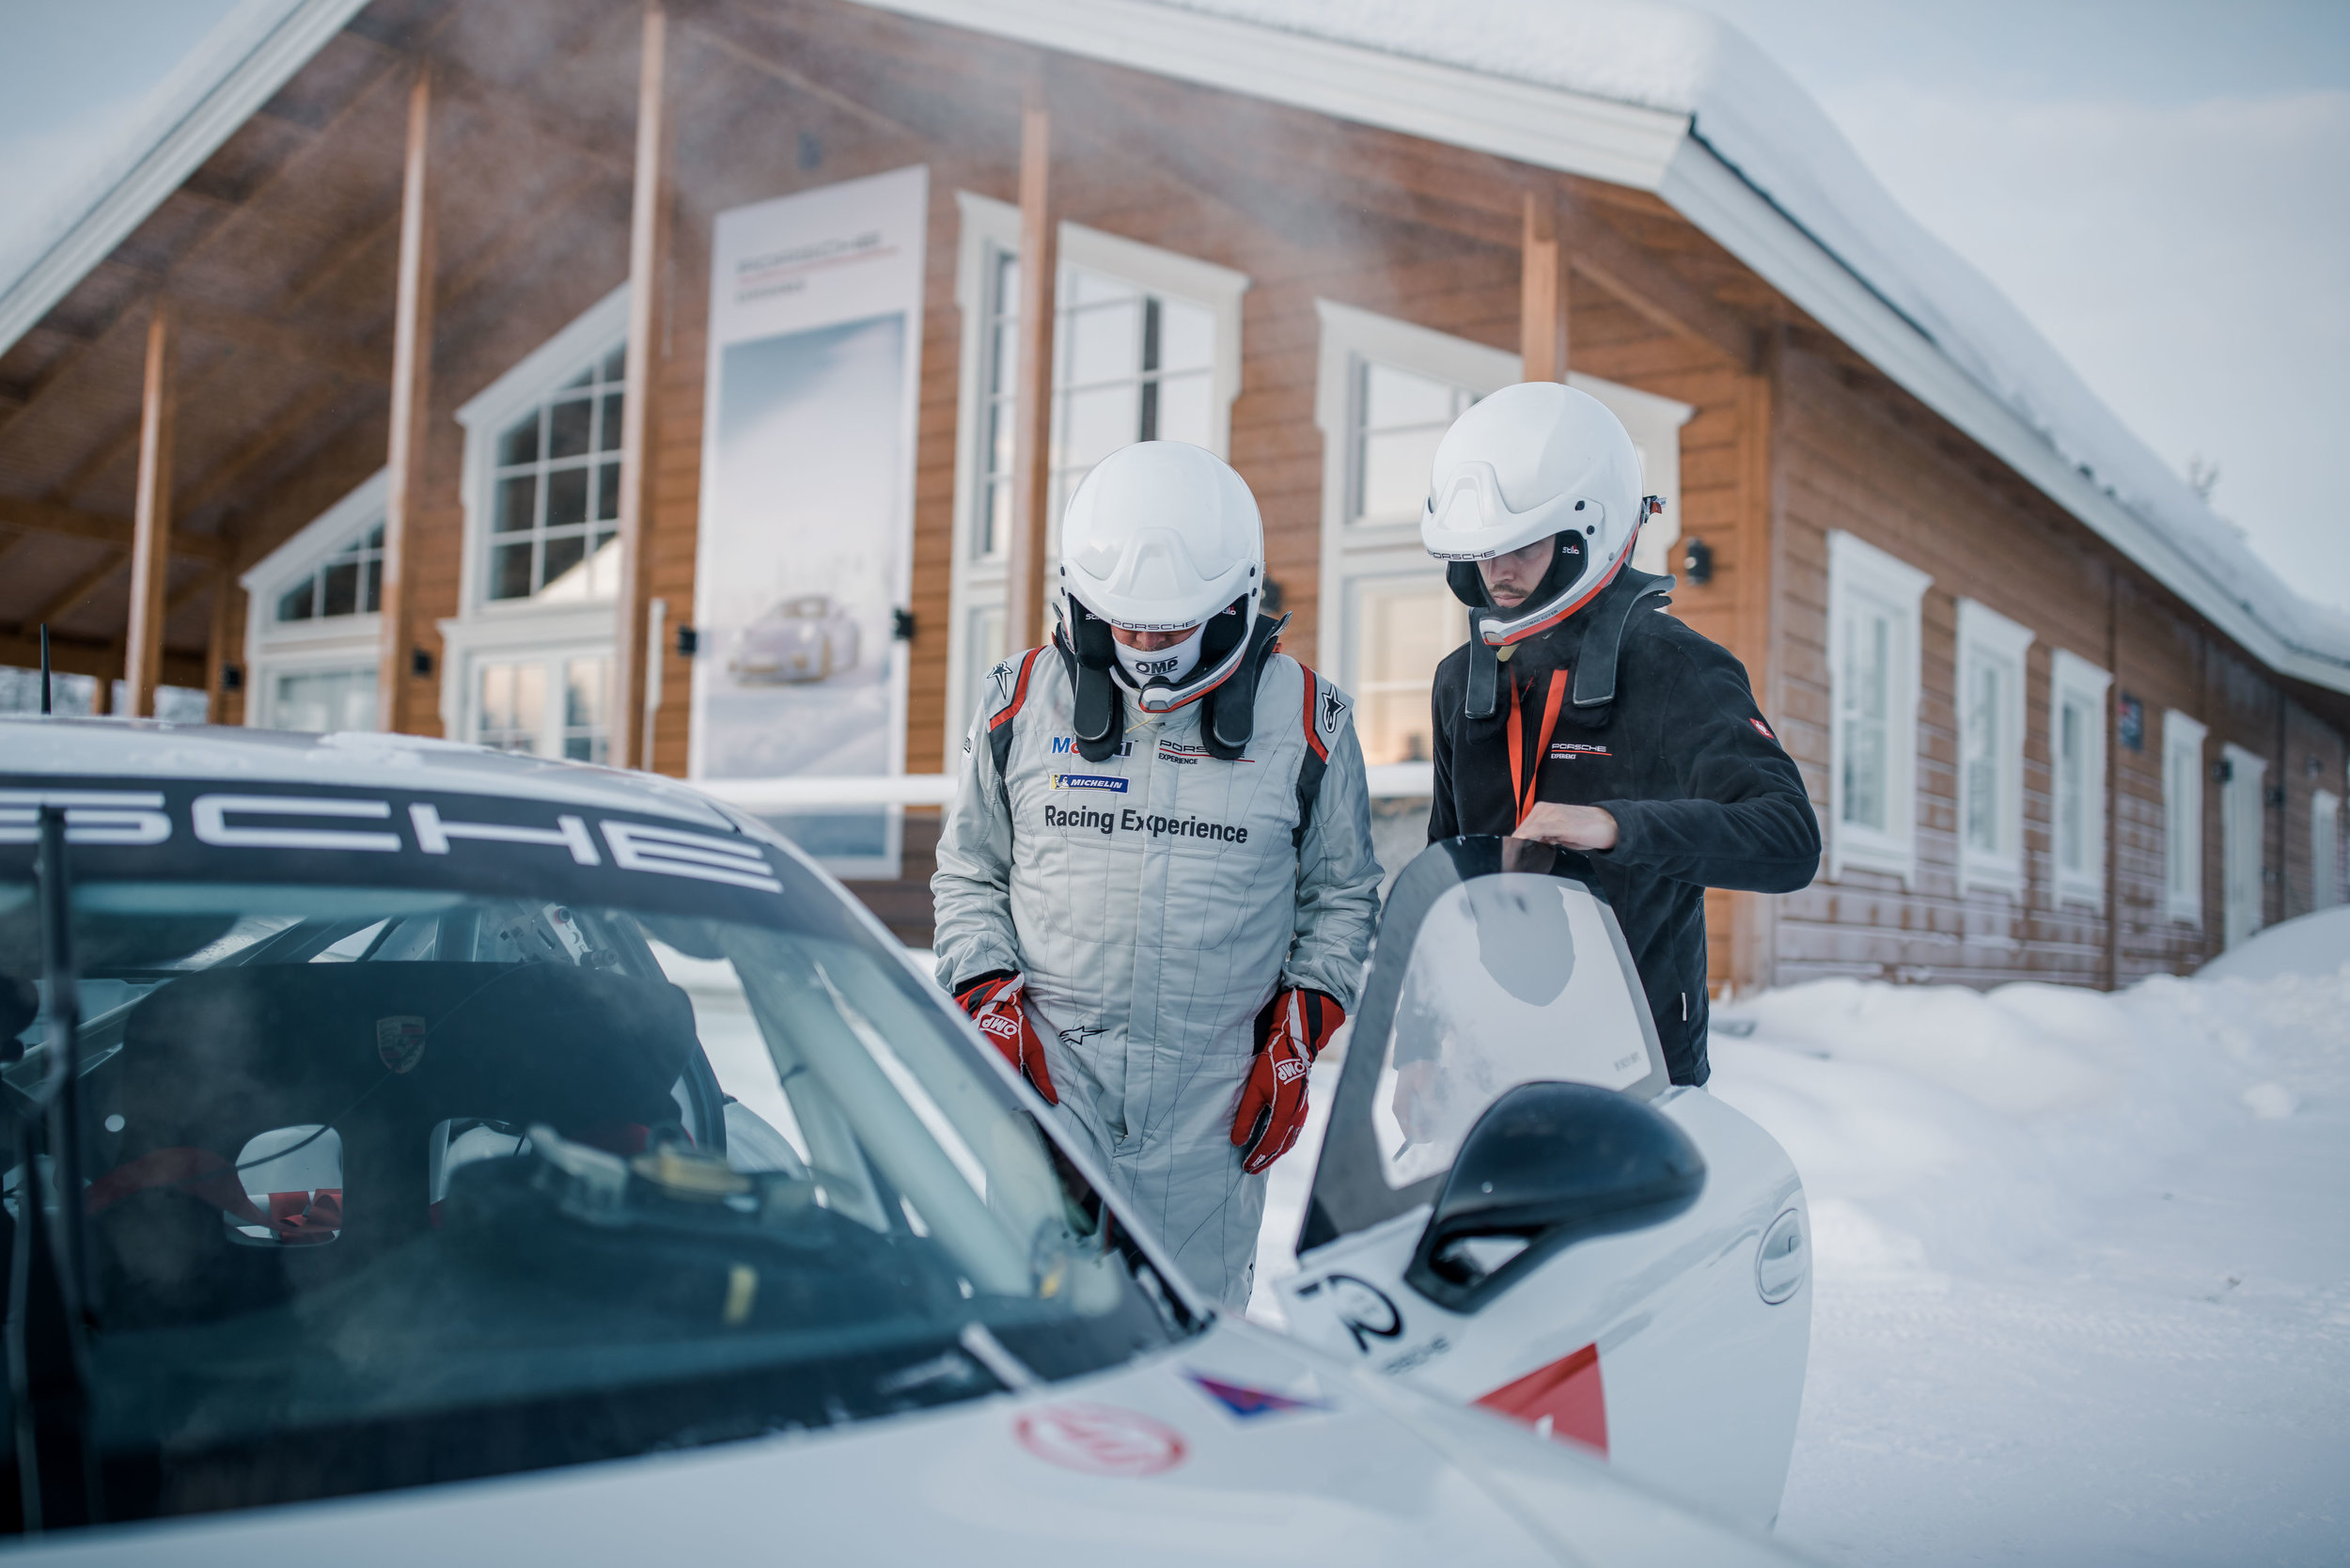 Porsche Ice Experience on Ice_30_01_2019_0939_175756.jpg